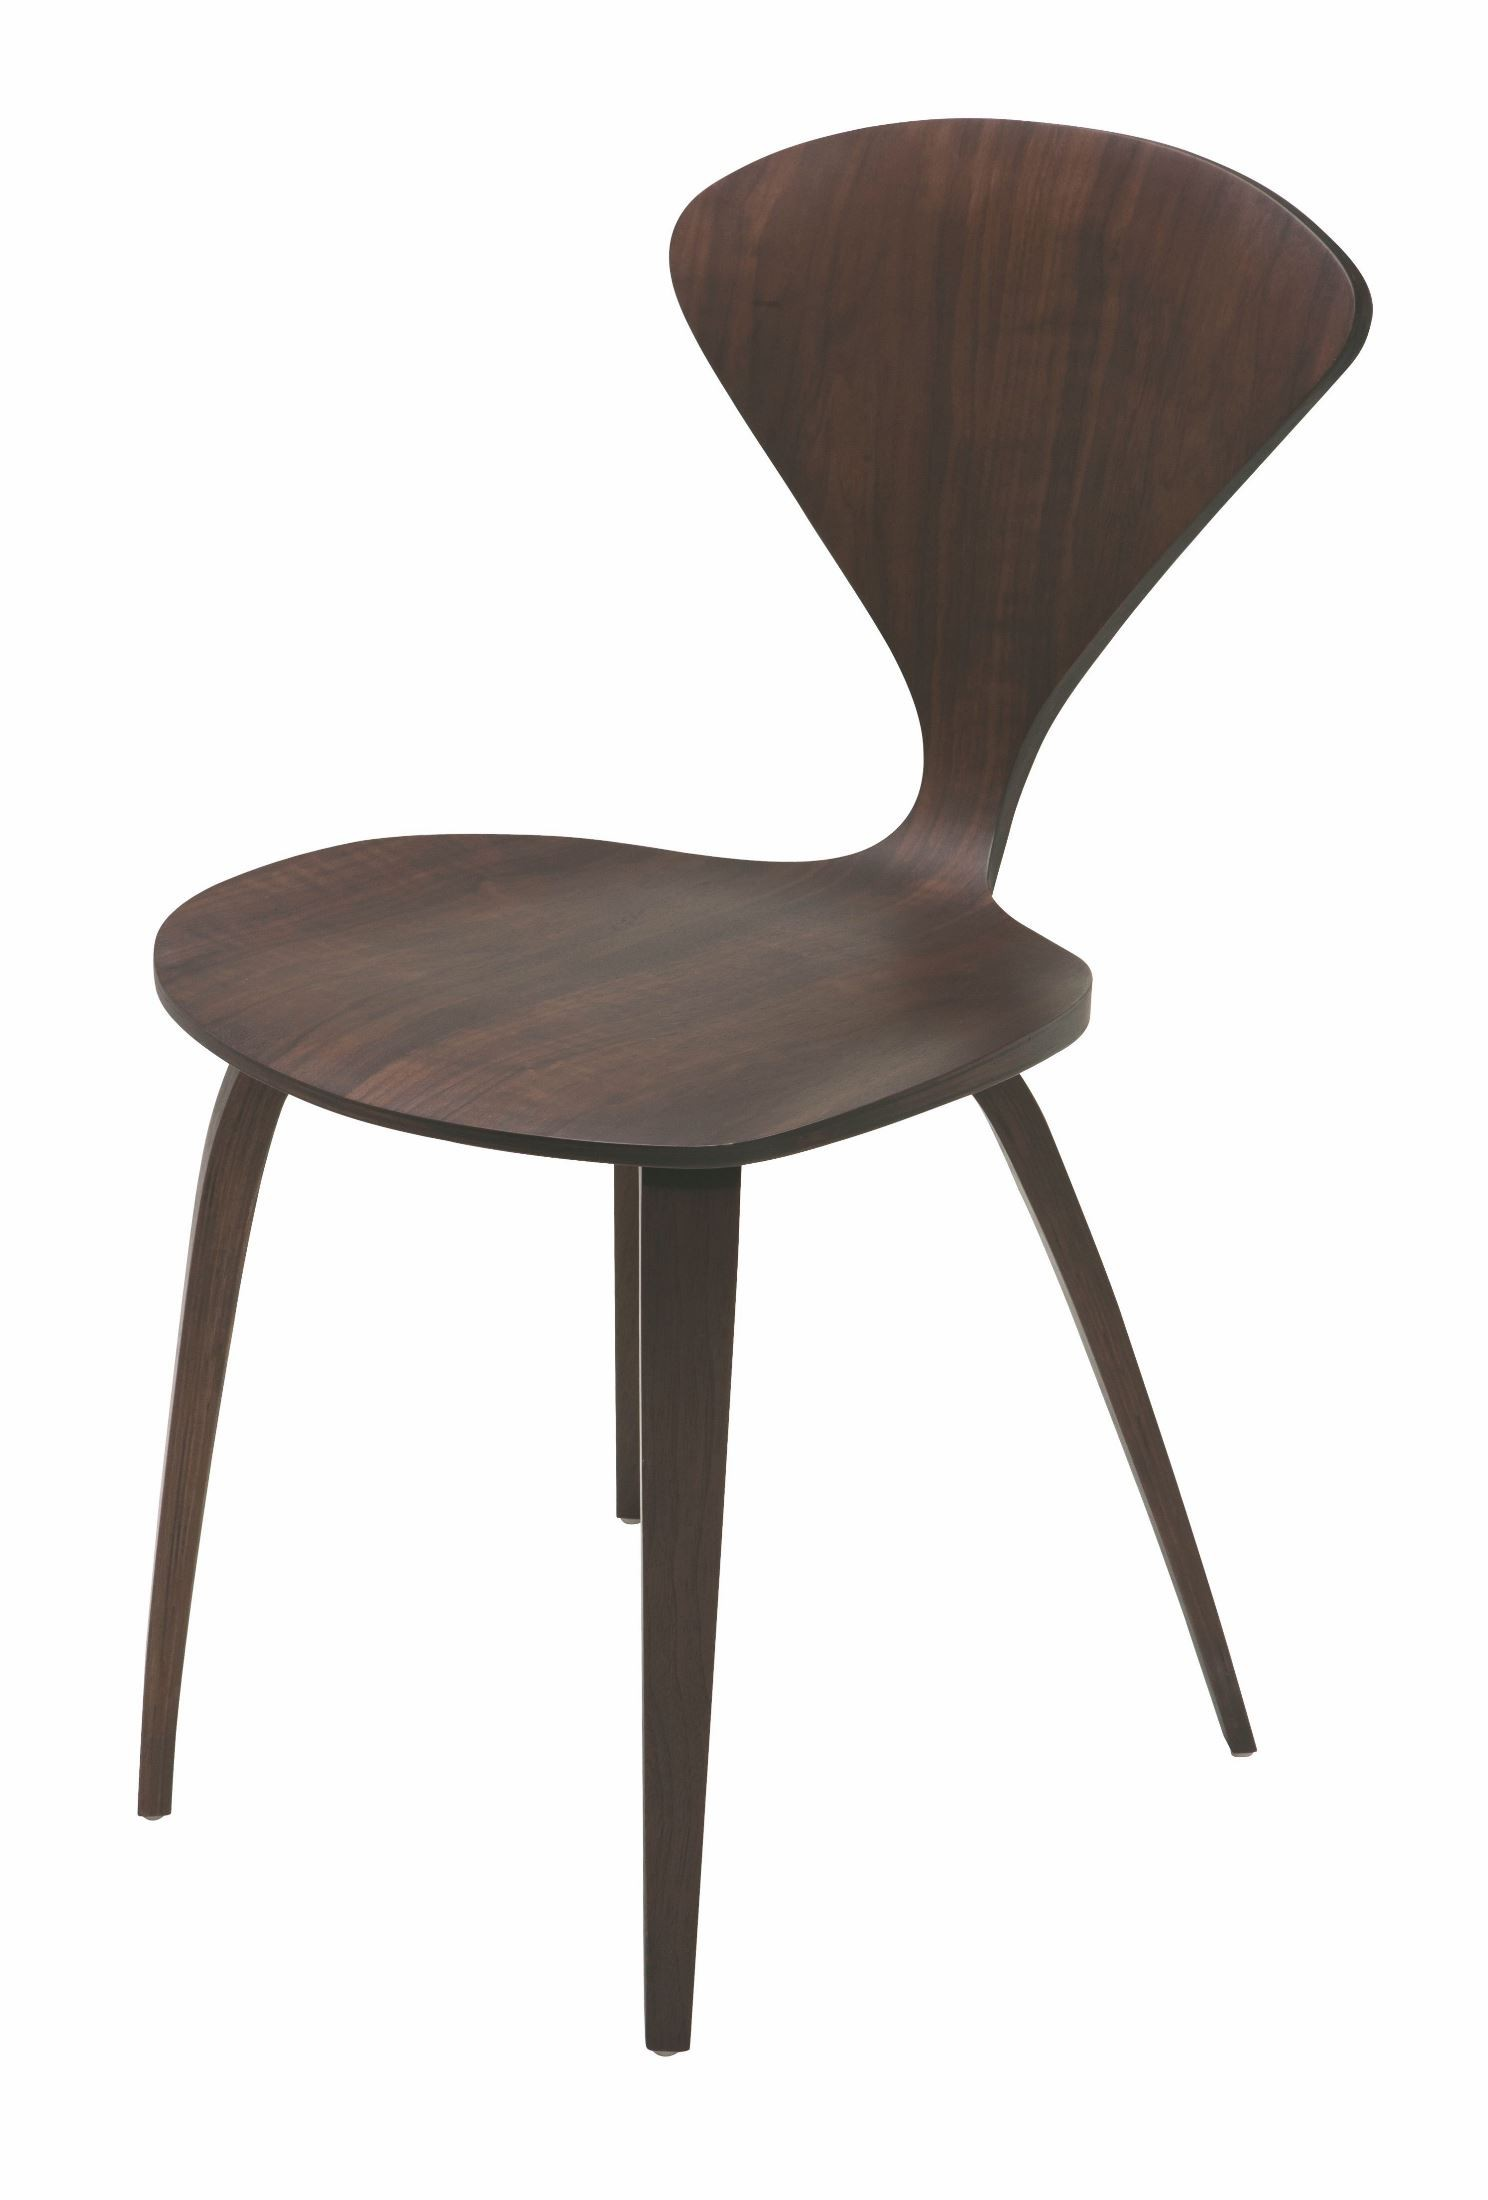 dark walnut dining chairs denver broncos bean bag chair satine wood hgem358 nuevo